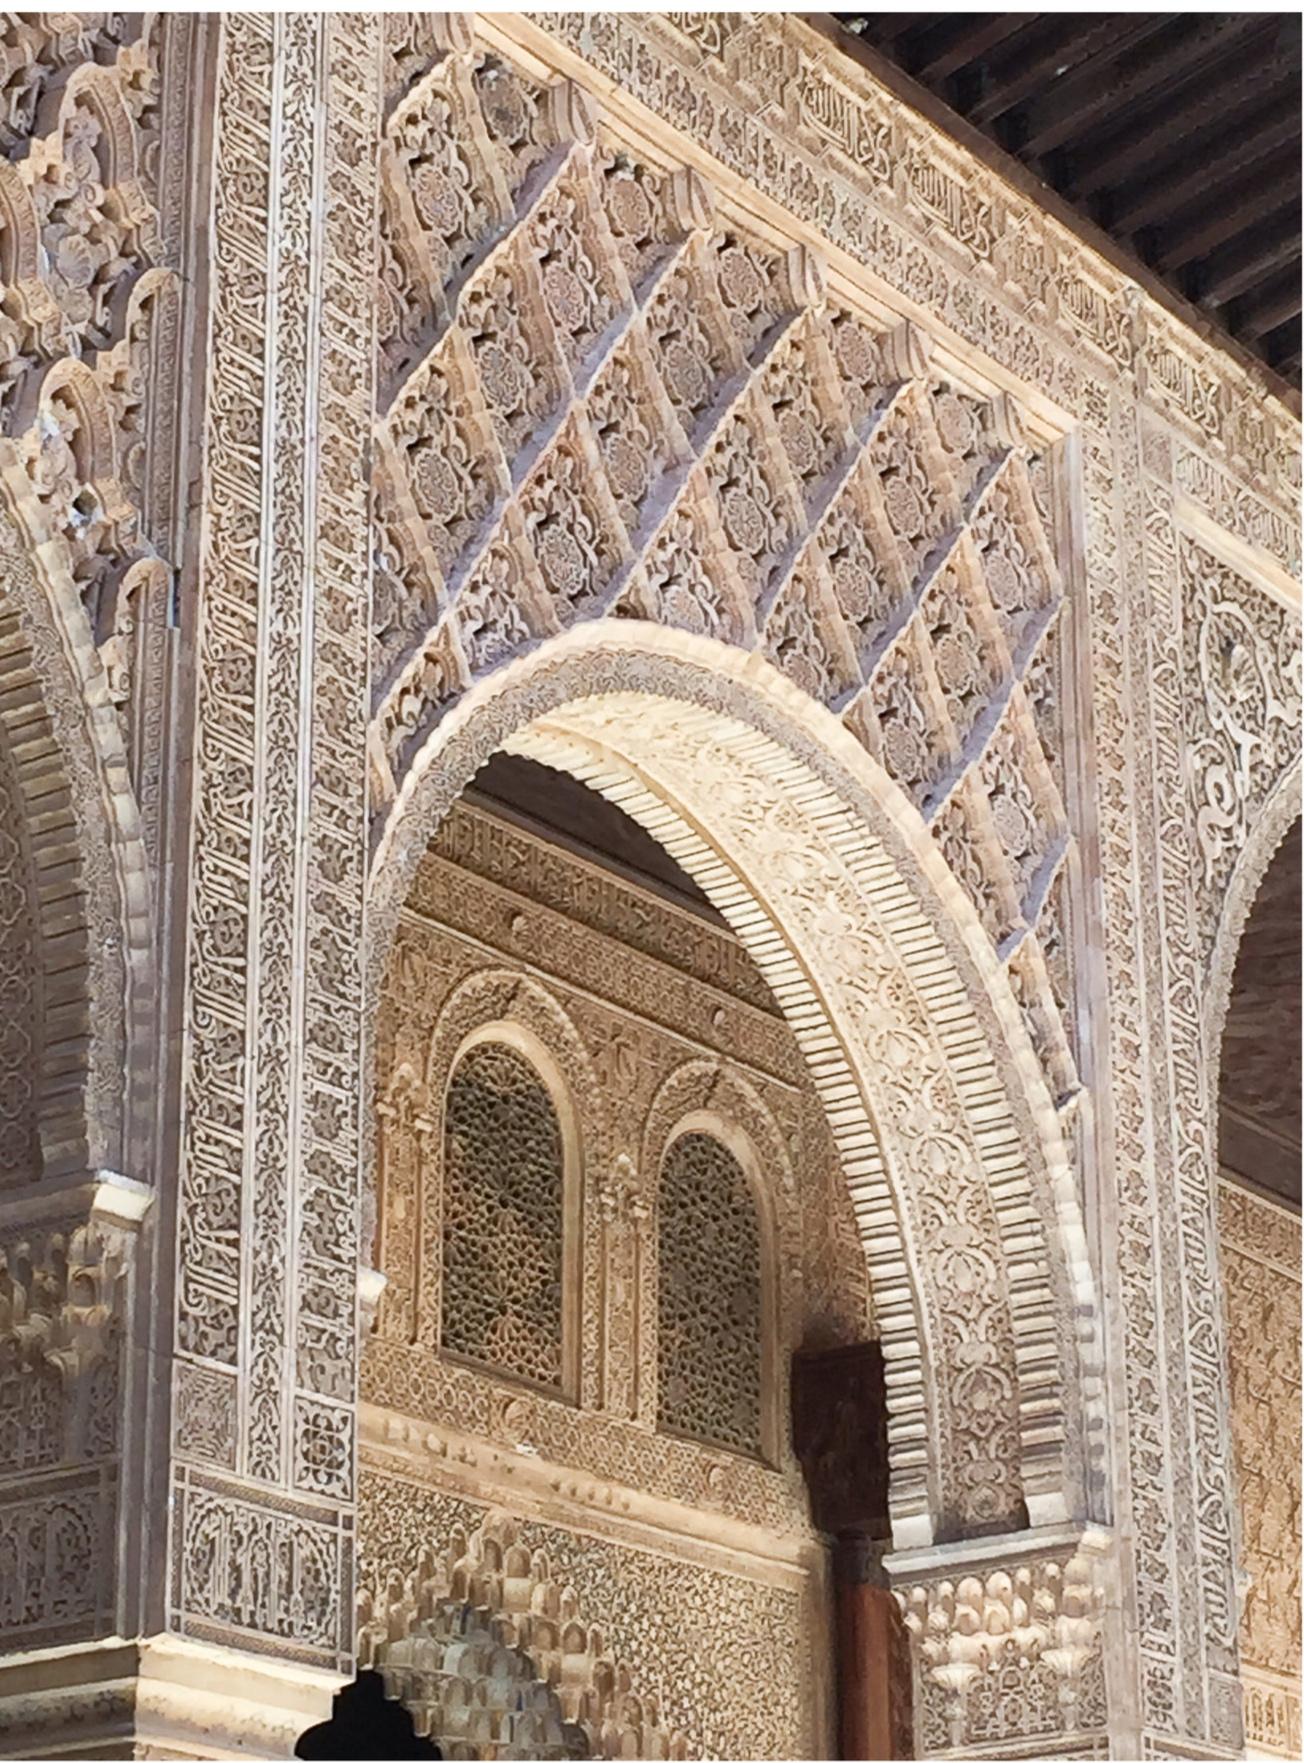 Alcázar hallway showing a good example of  Mudéjar  architecture and motifs. Courtesy of Mary Dana Abbott